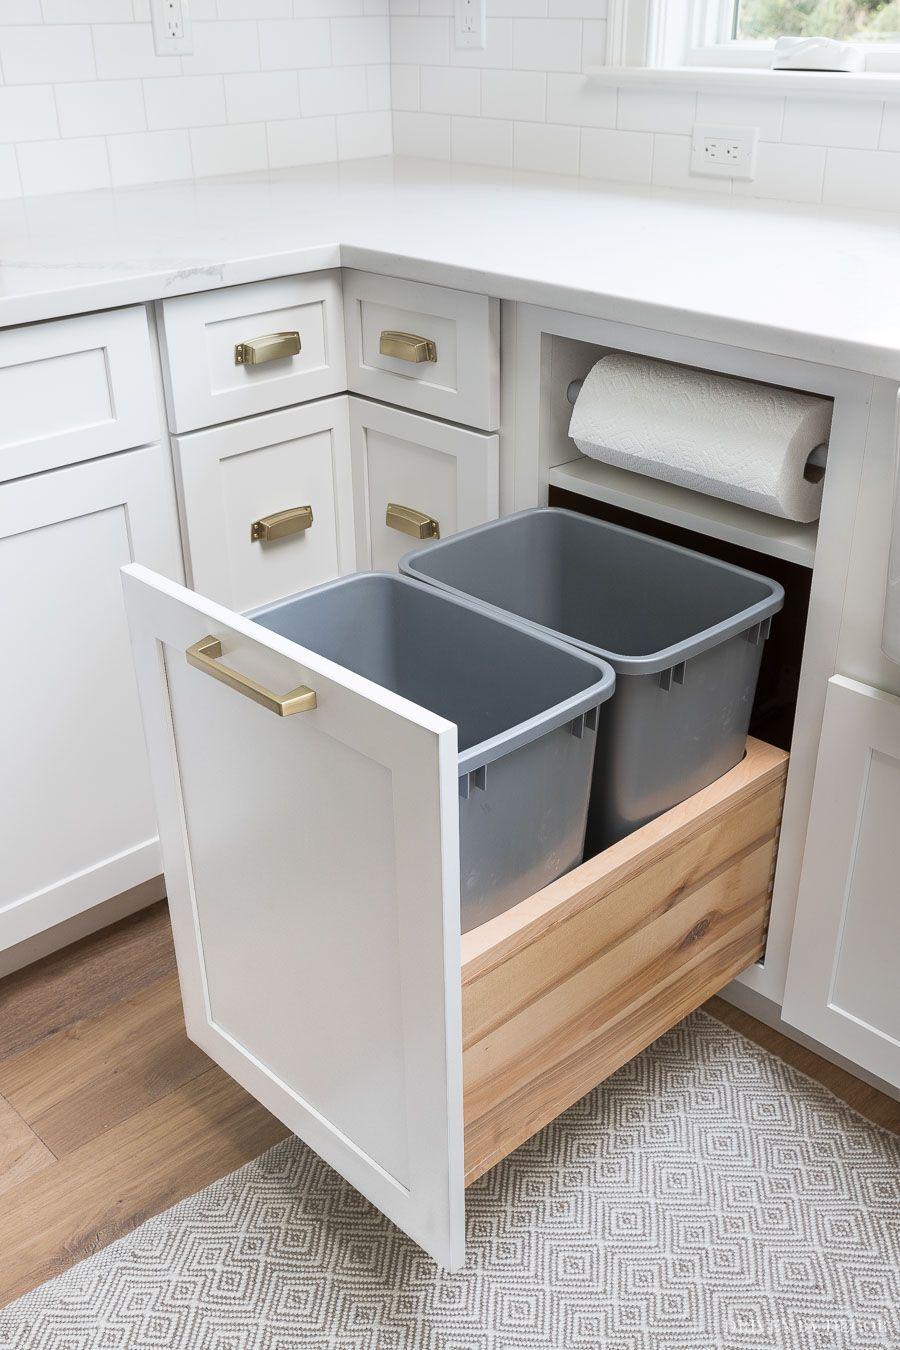 33+ Creative Kitchen Cabinet Ideas Trend in 2019 – Sooziq.com